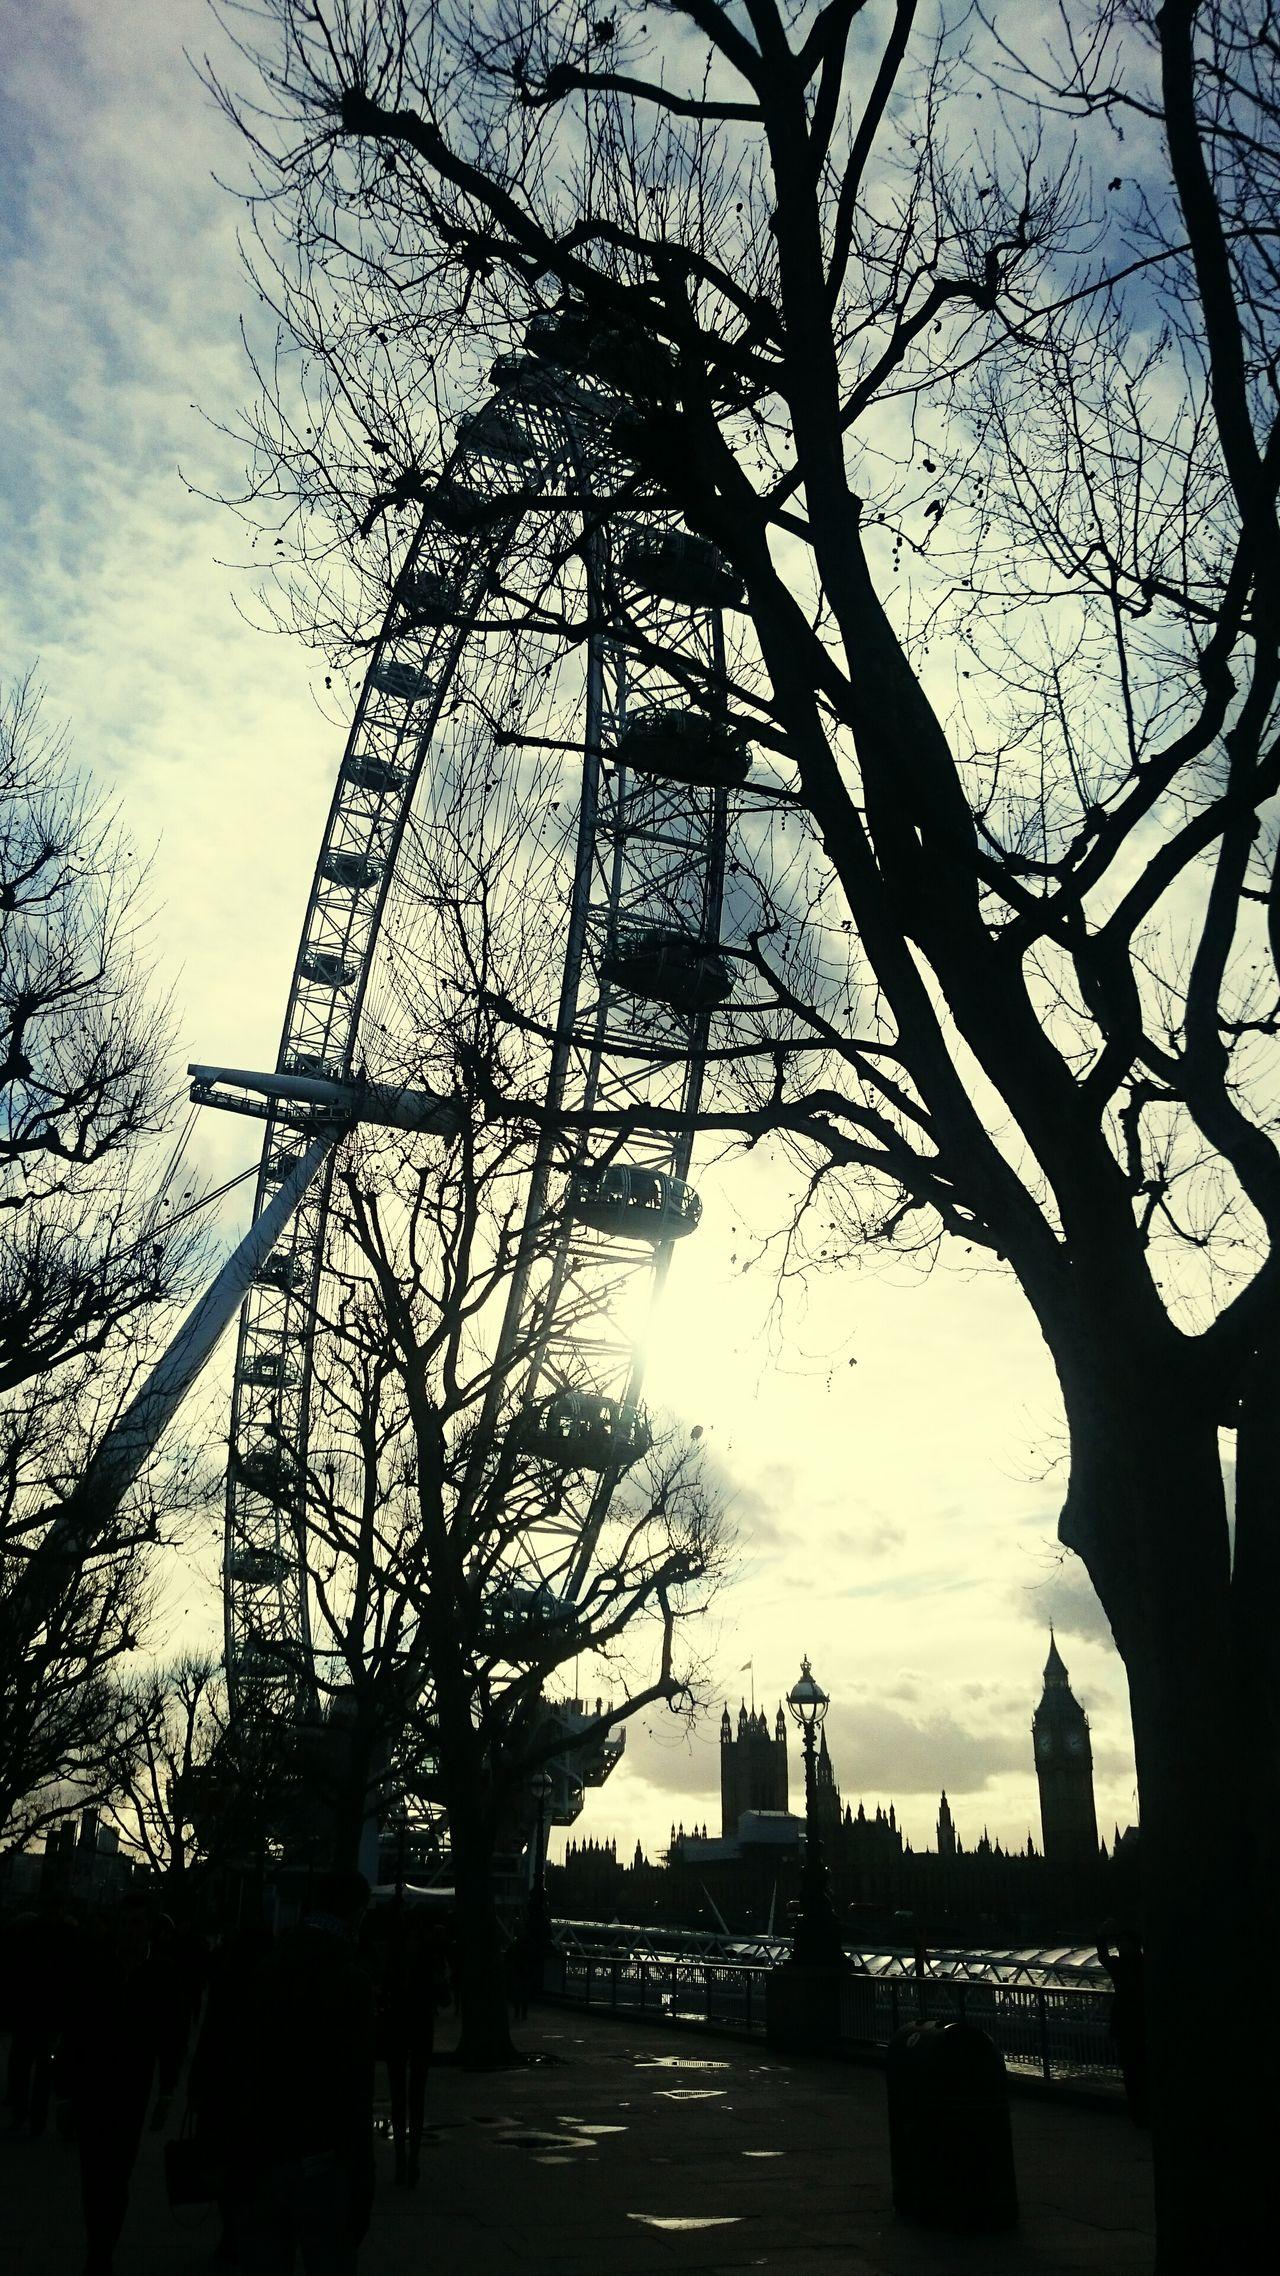 London EYE Am London Urban Architecture Modern Landmark Sky Sunlight Silhouette The City Light